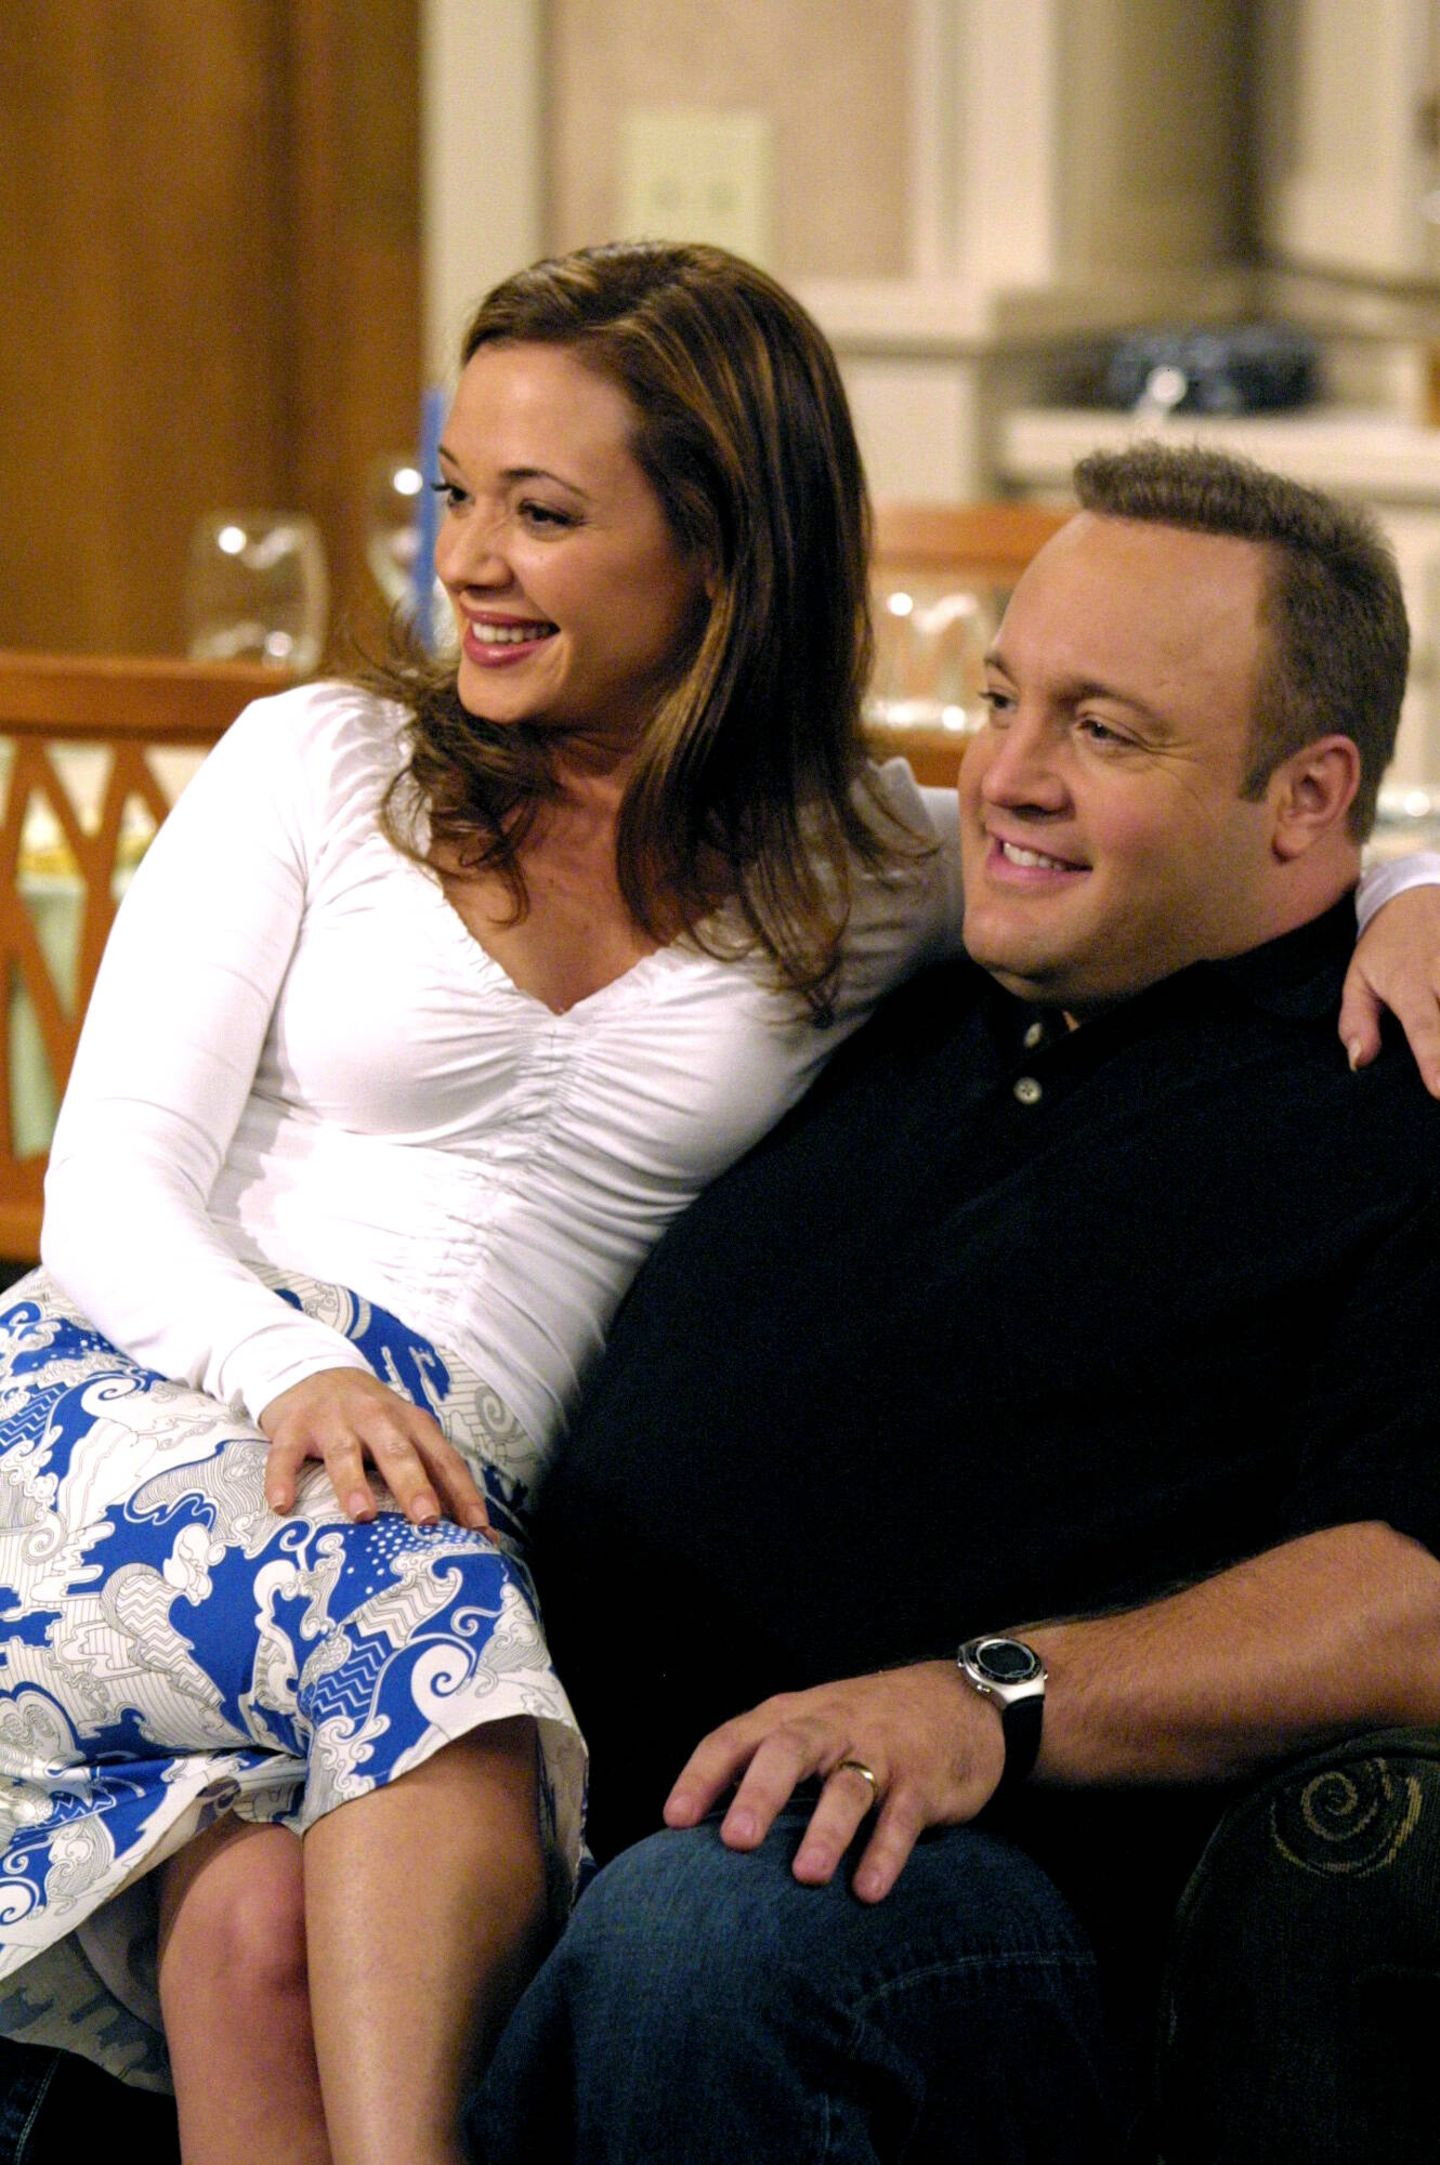 Serienpaare: Leah Rimini und Kevin James